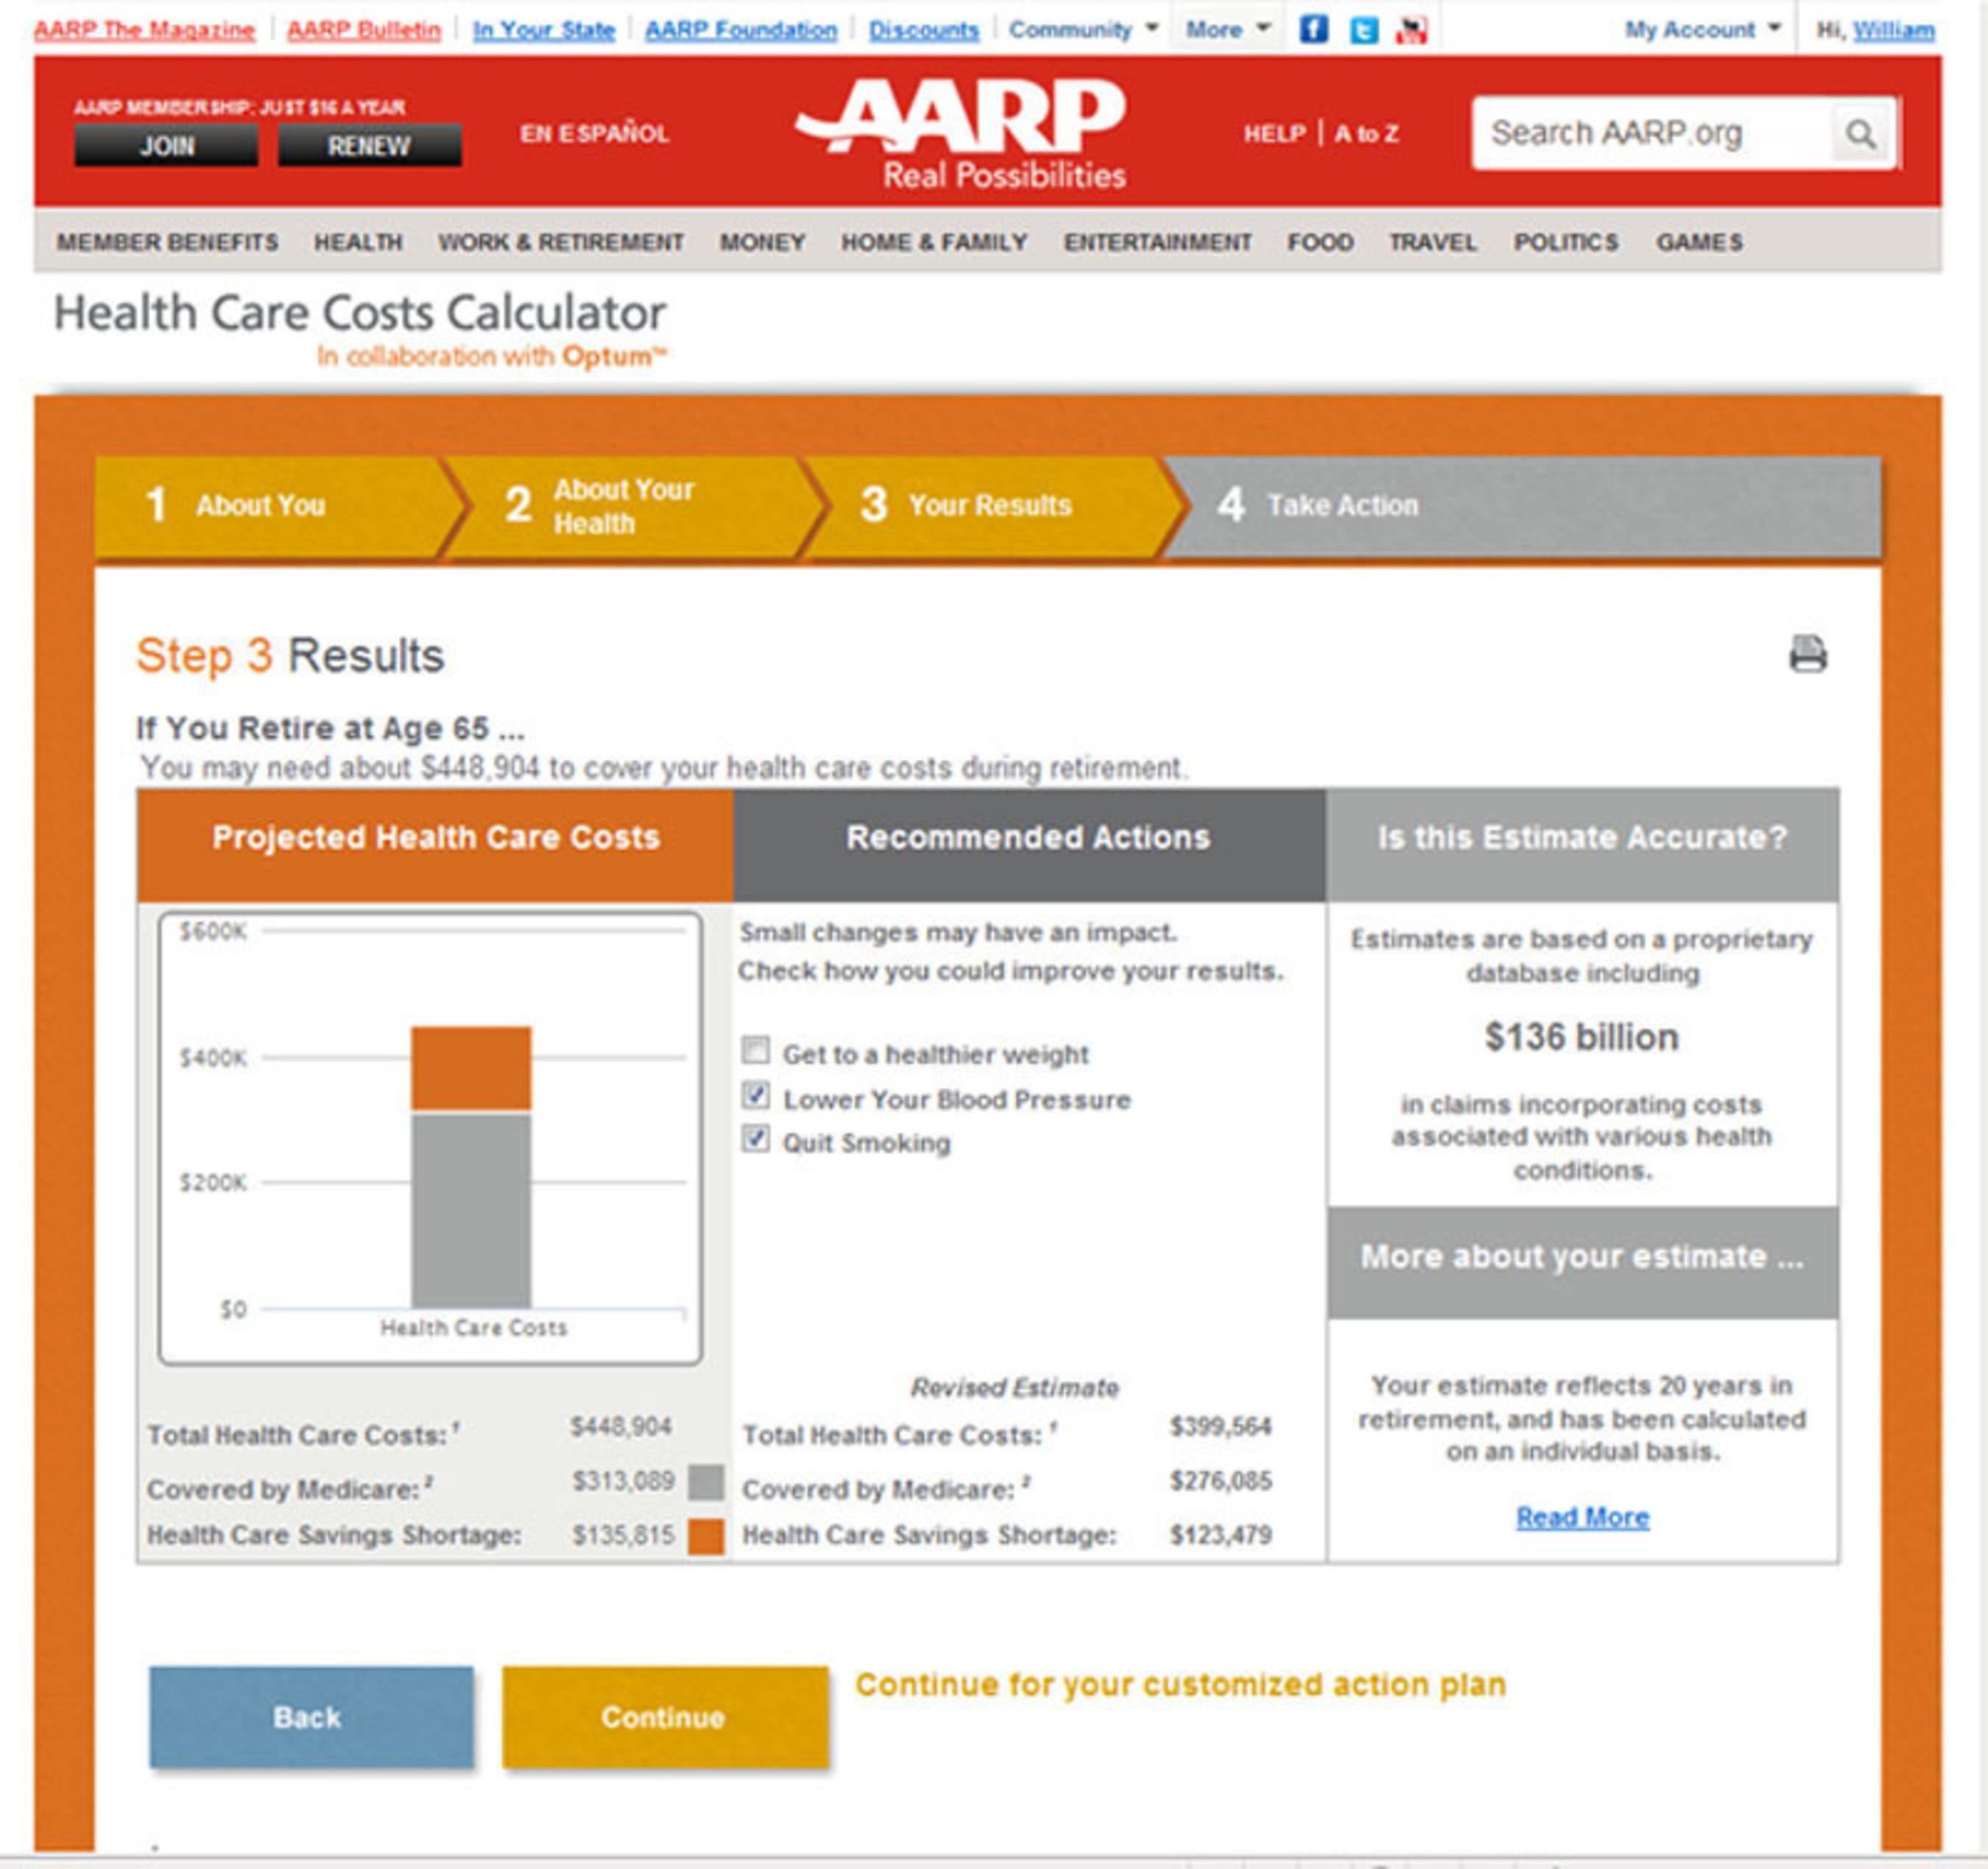 AARP's free online Health Care Costs Calculator sample results. (PRNewsFoto/AARP)